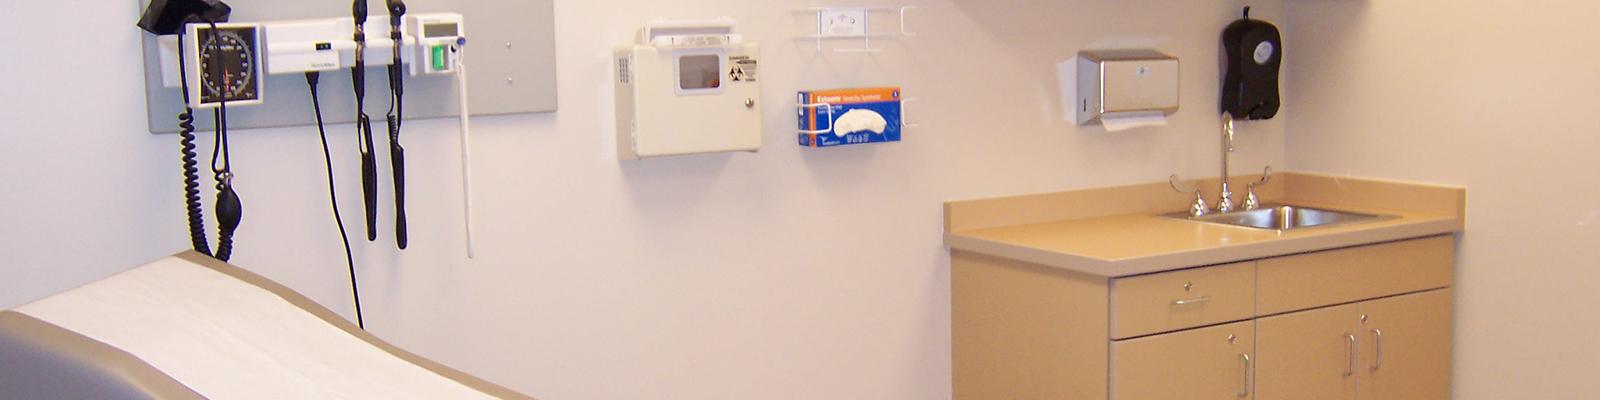 Cook Hospital & Nursing Care Unit image 3